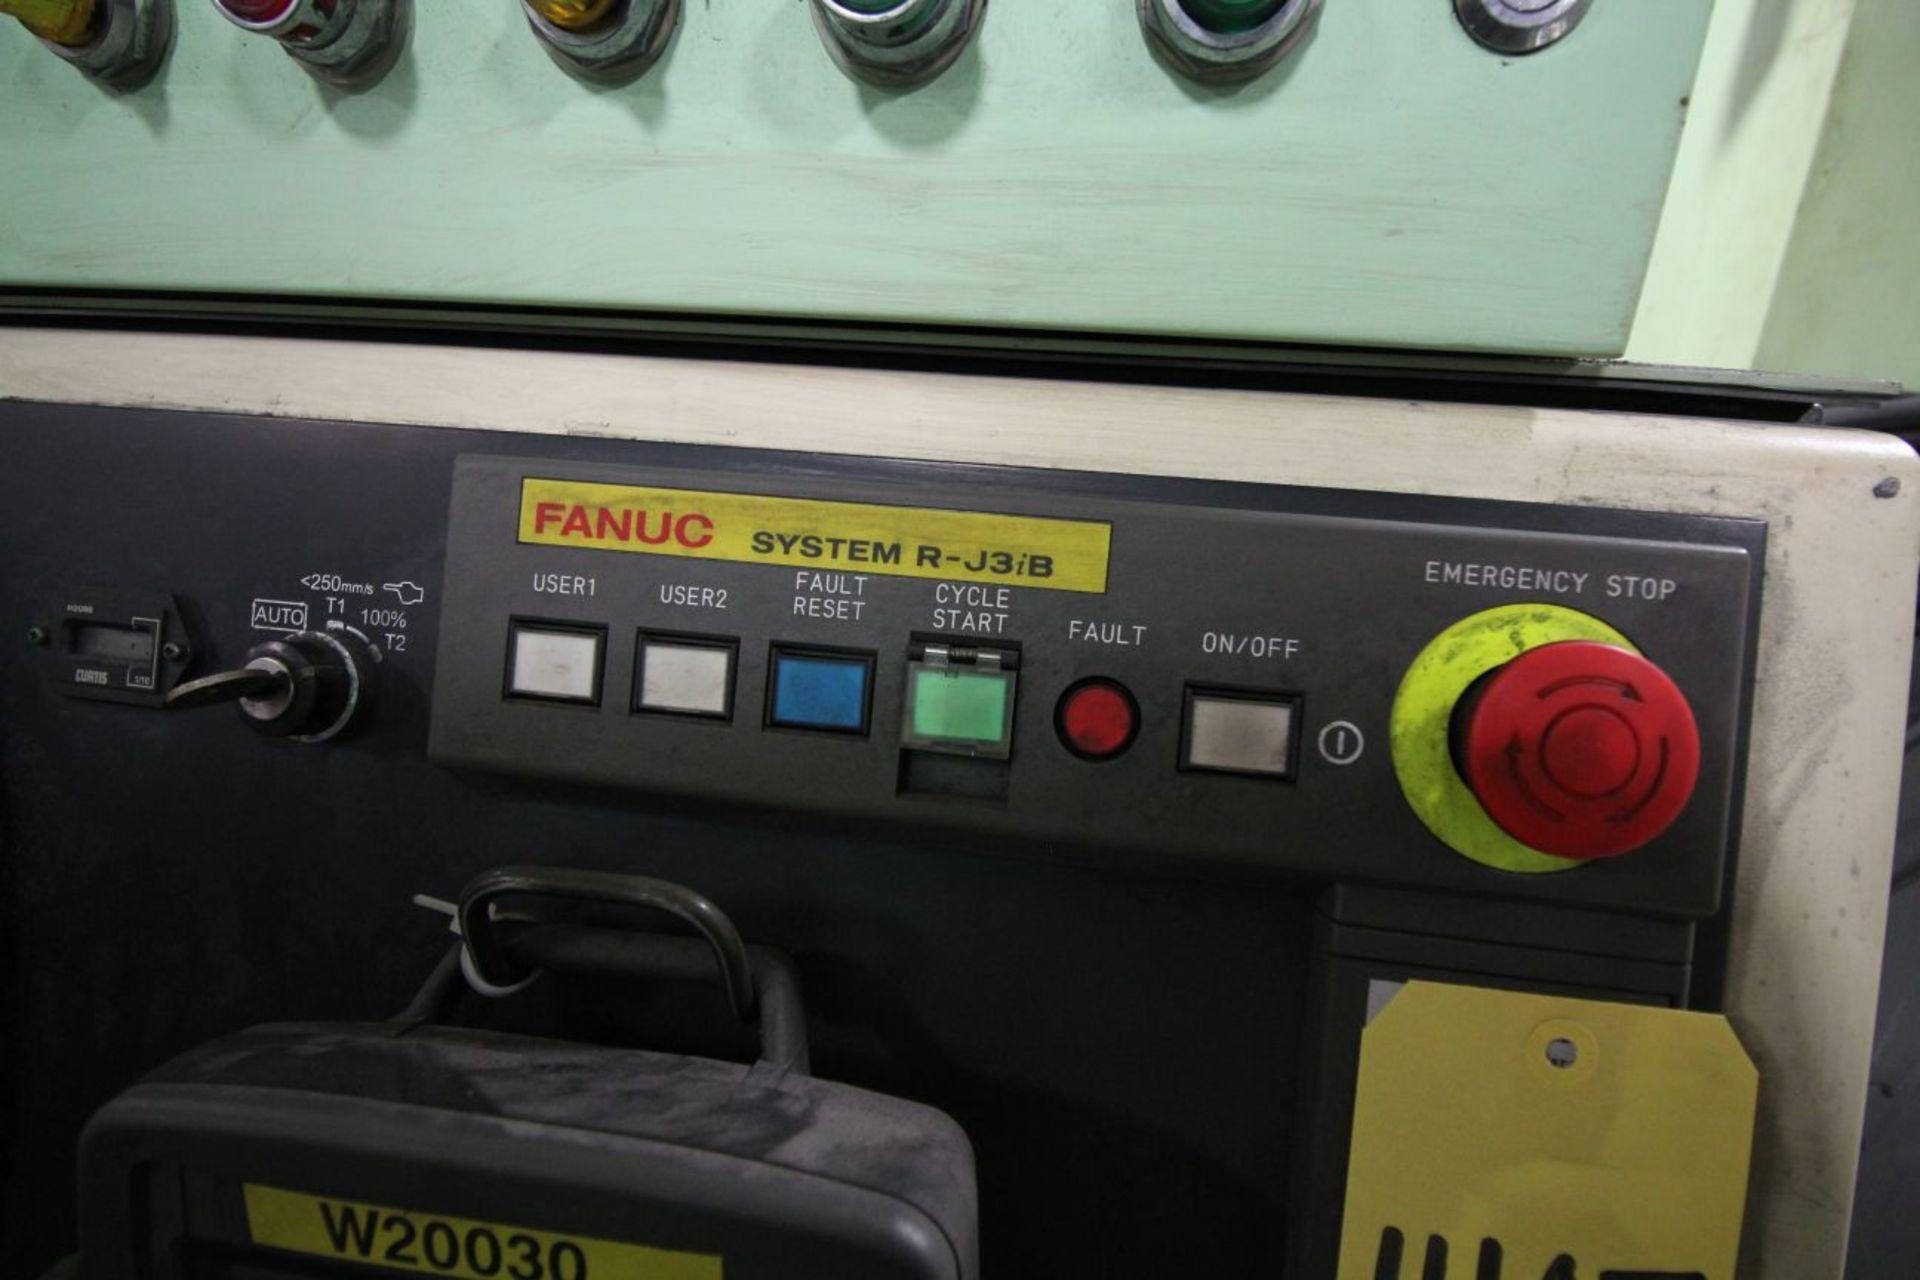 Lot 46 - FANUC ROBOT R-2000iA/165R WTIH R-J3iB CONTROLS, TEACH & CABLES, YEAR 2003, SN 57329